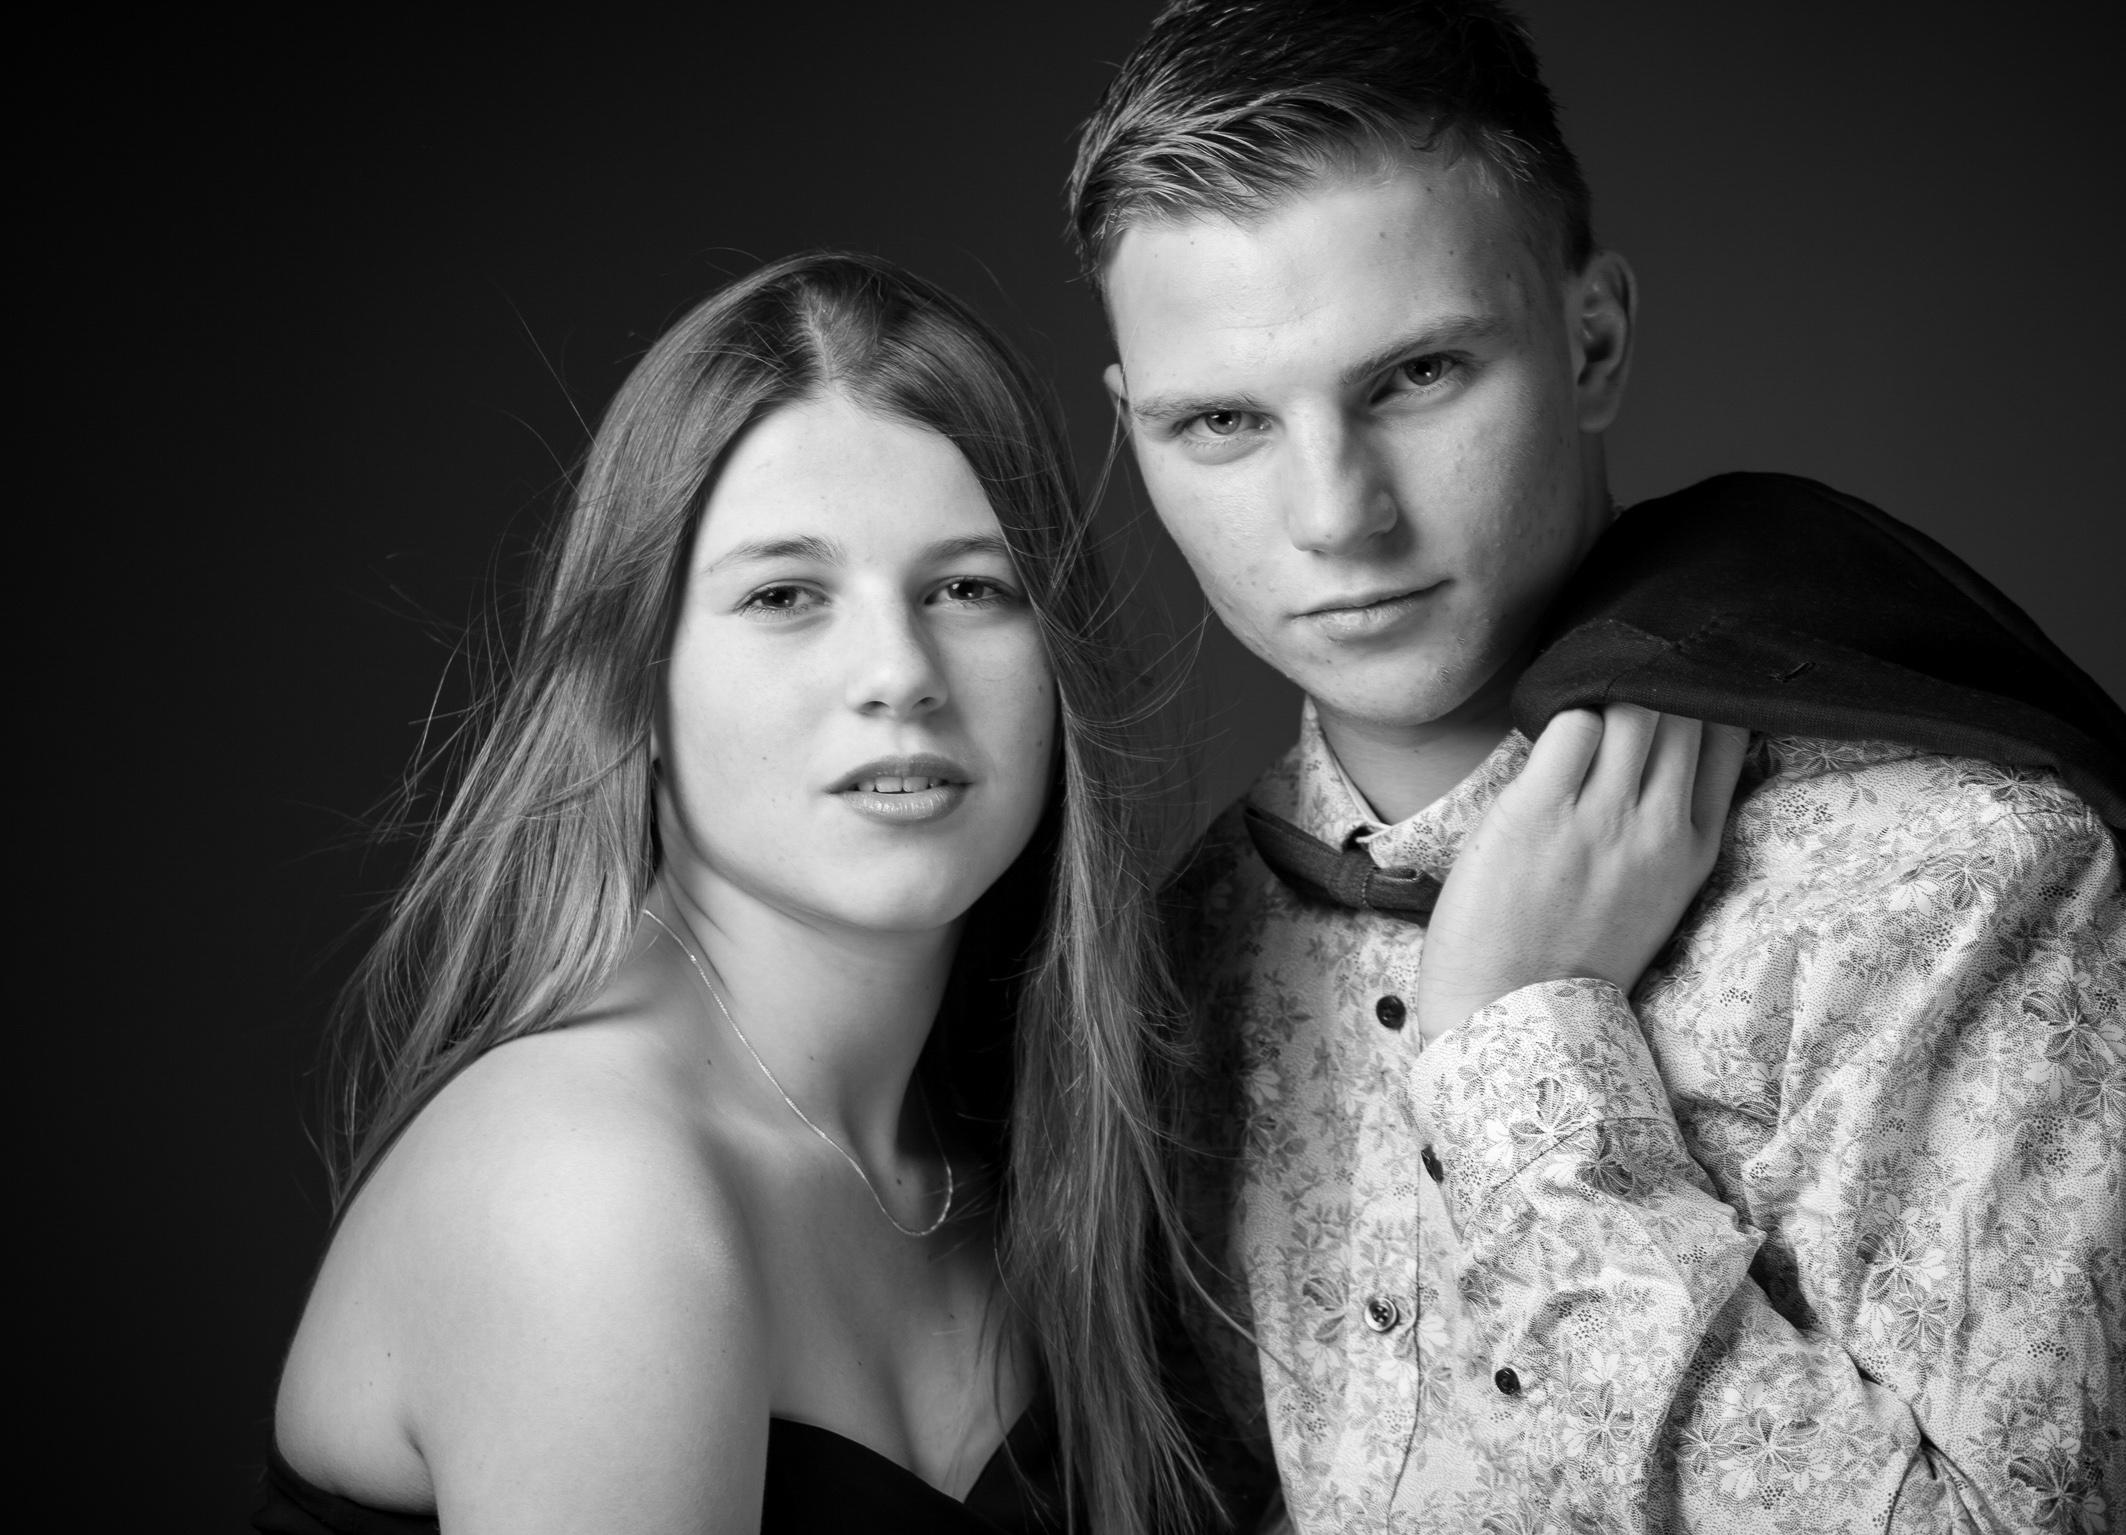 03-foto-familia-celine-pech-andorra60